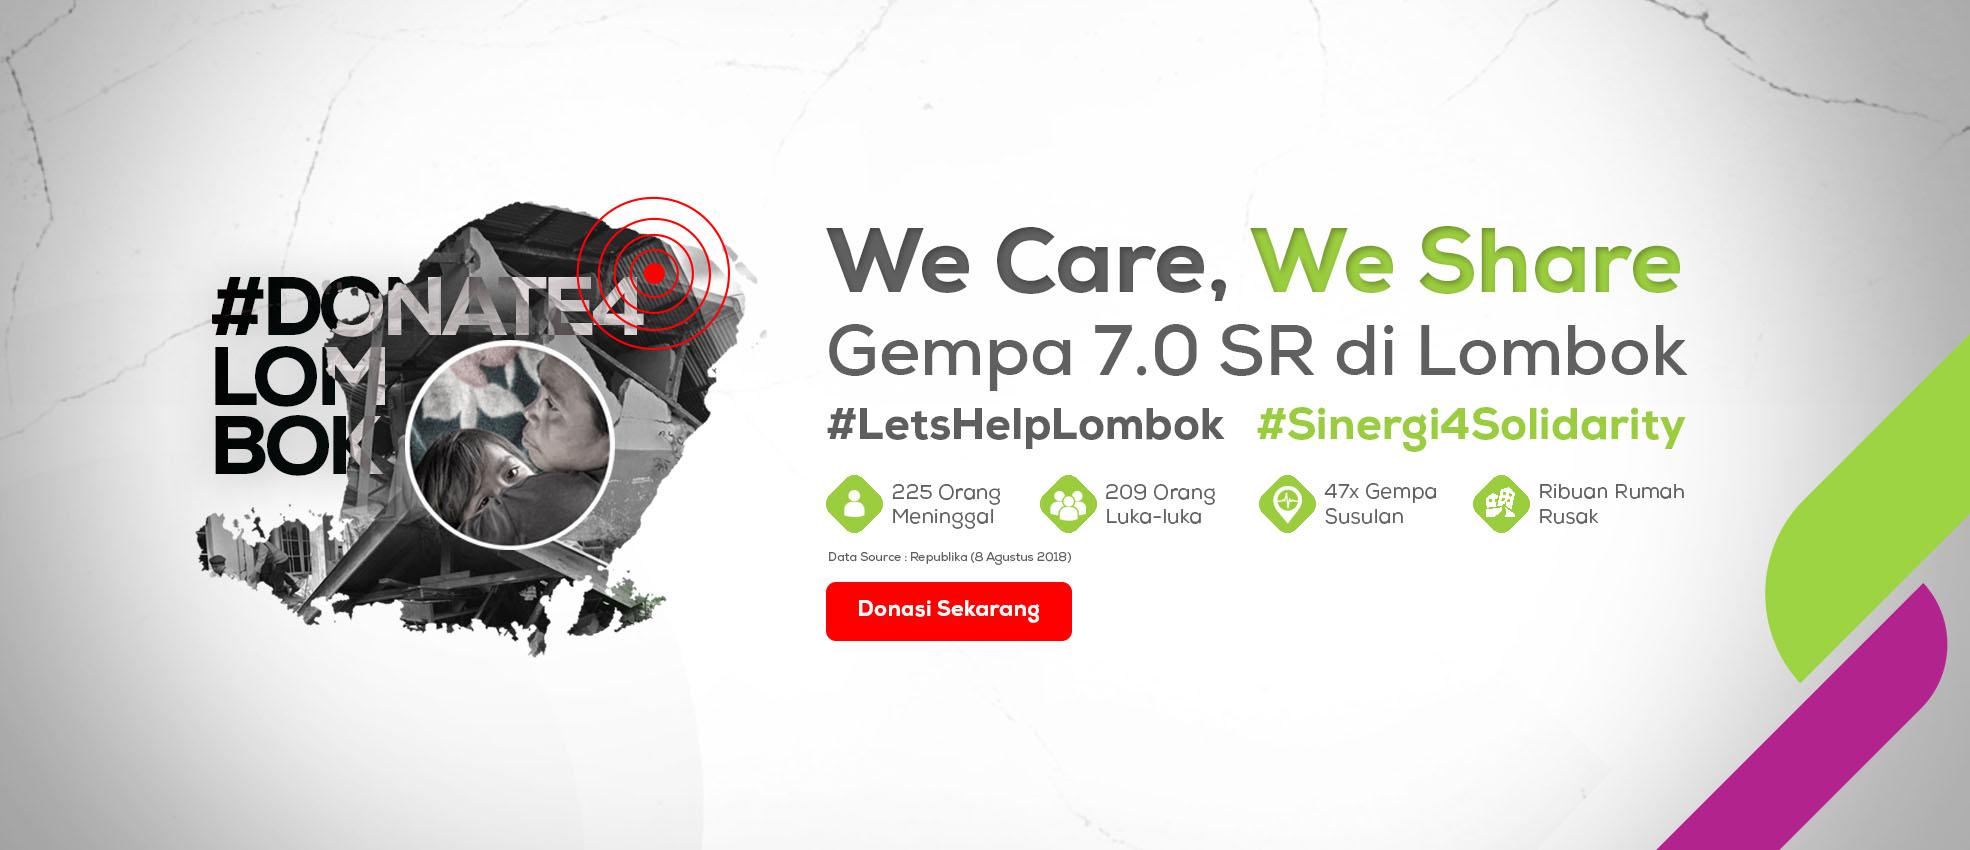 gempa lombok infografis